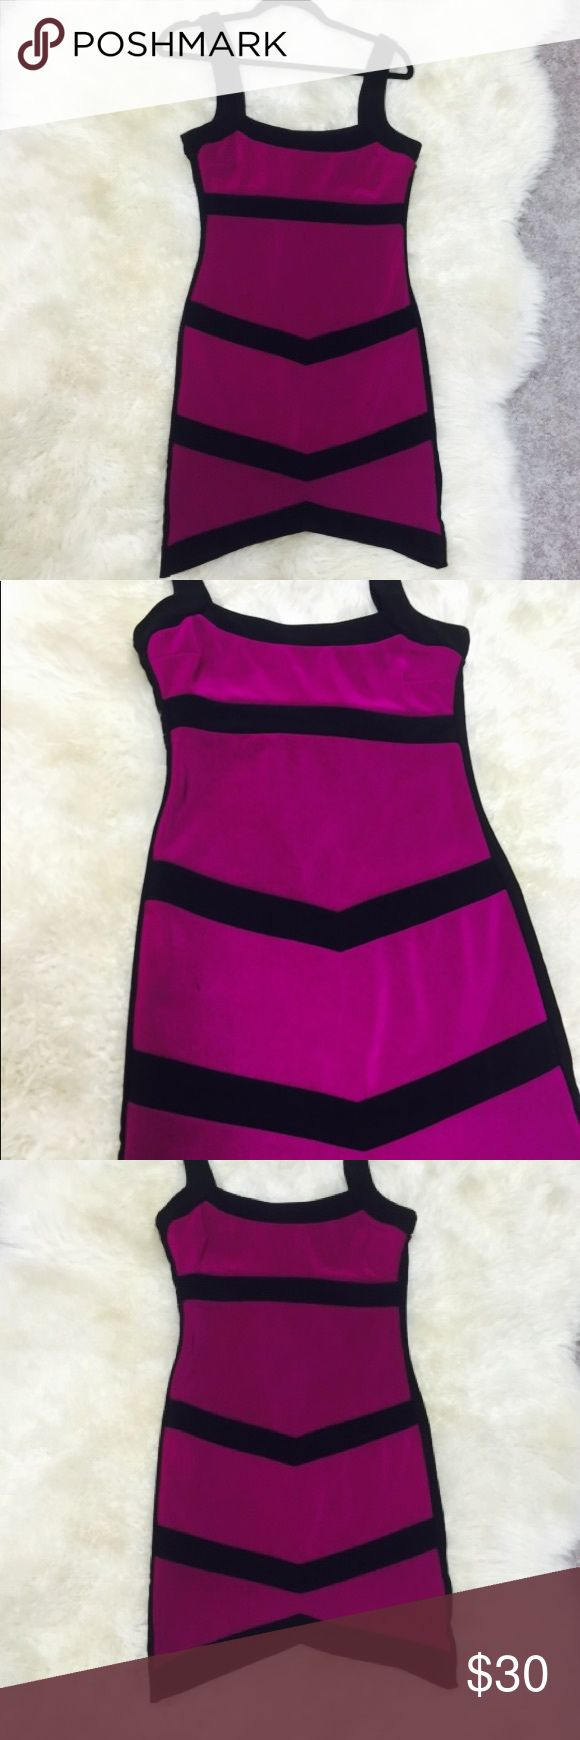 Purple mini dress size S Purple mini dress S Dresses Mini